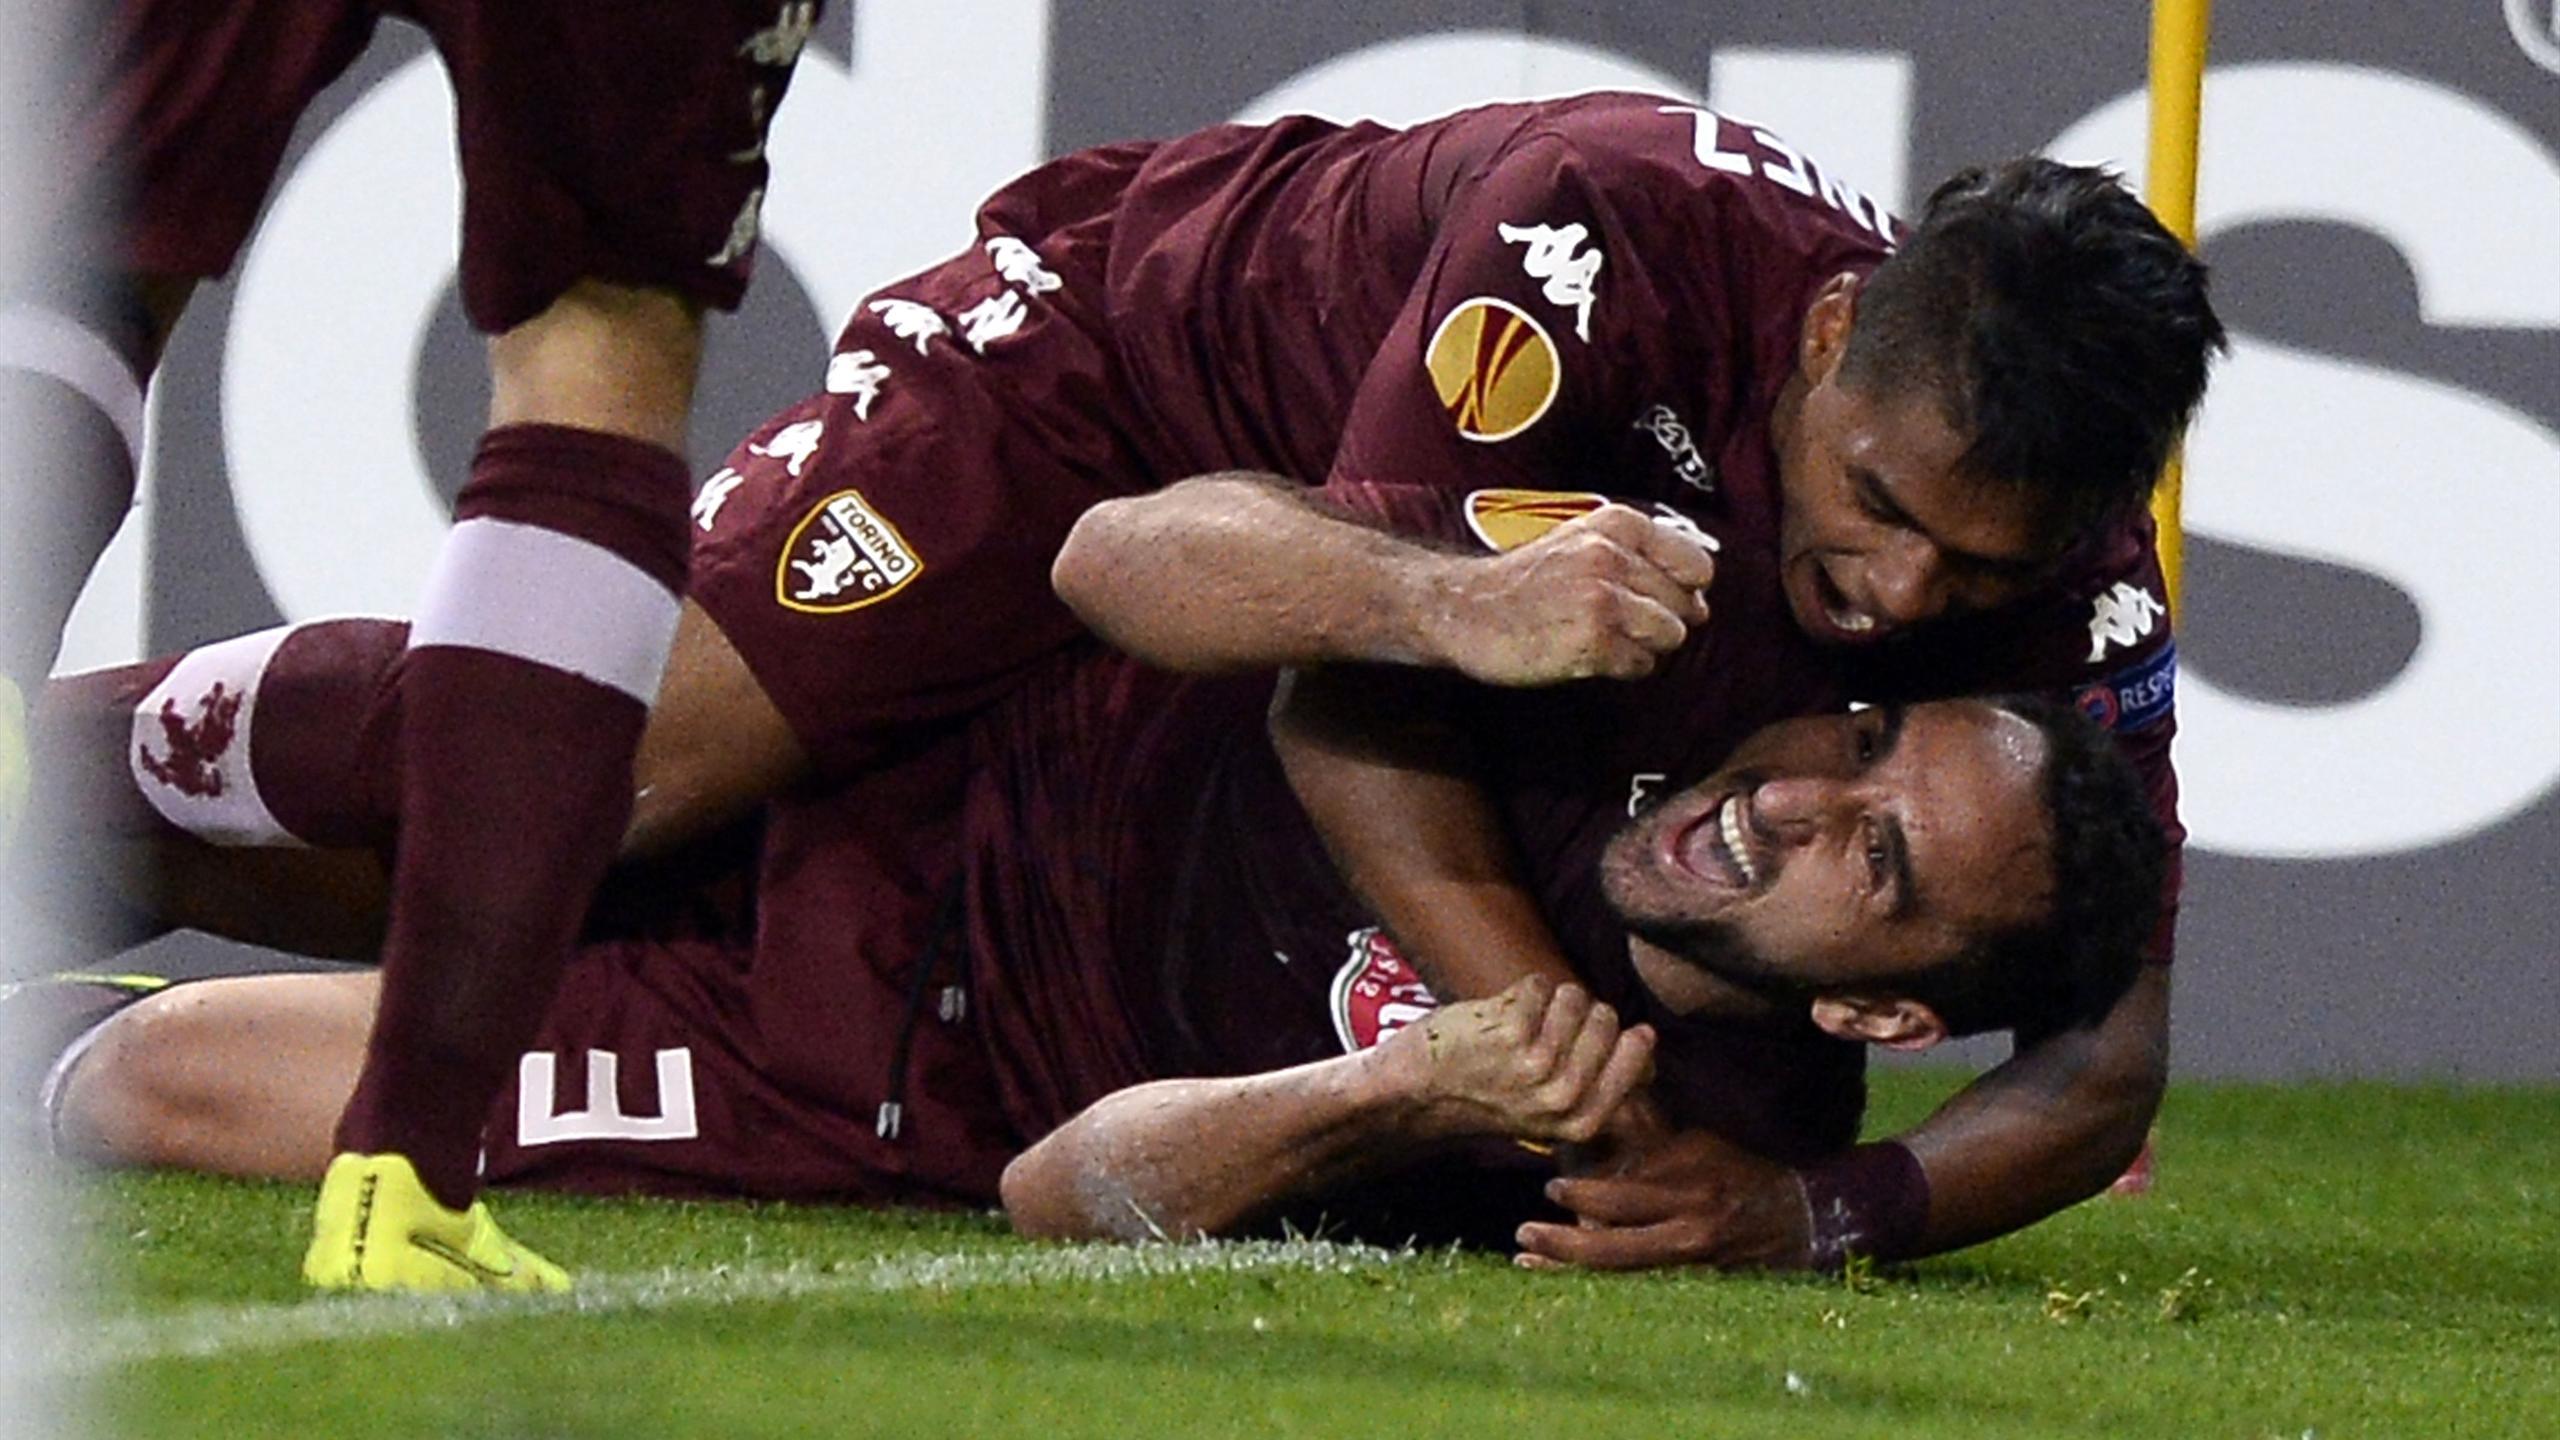 Video: Torino vs HJK